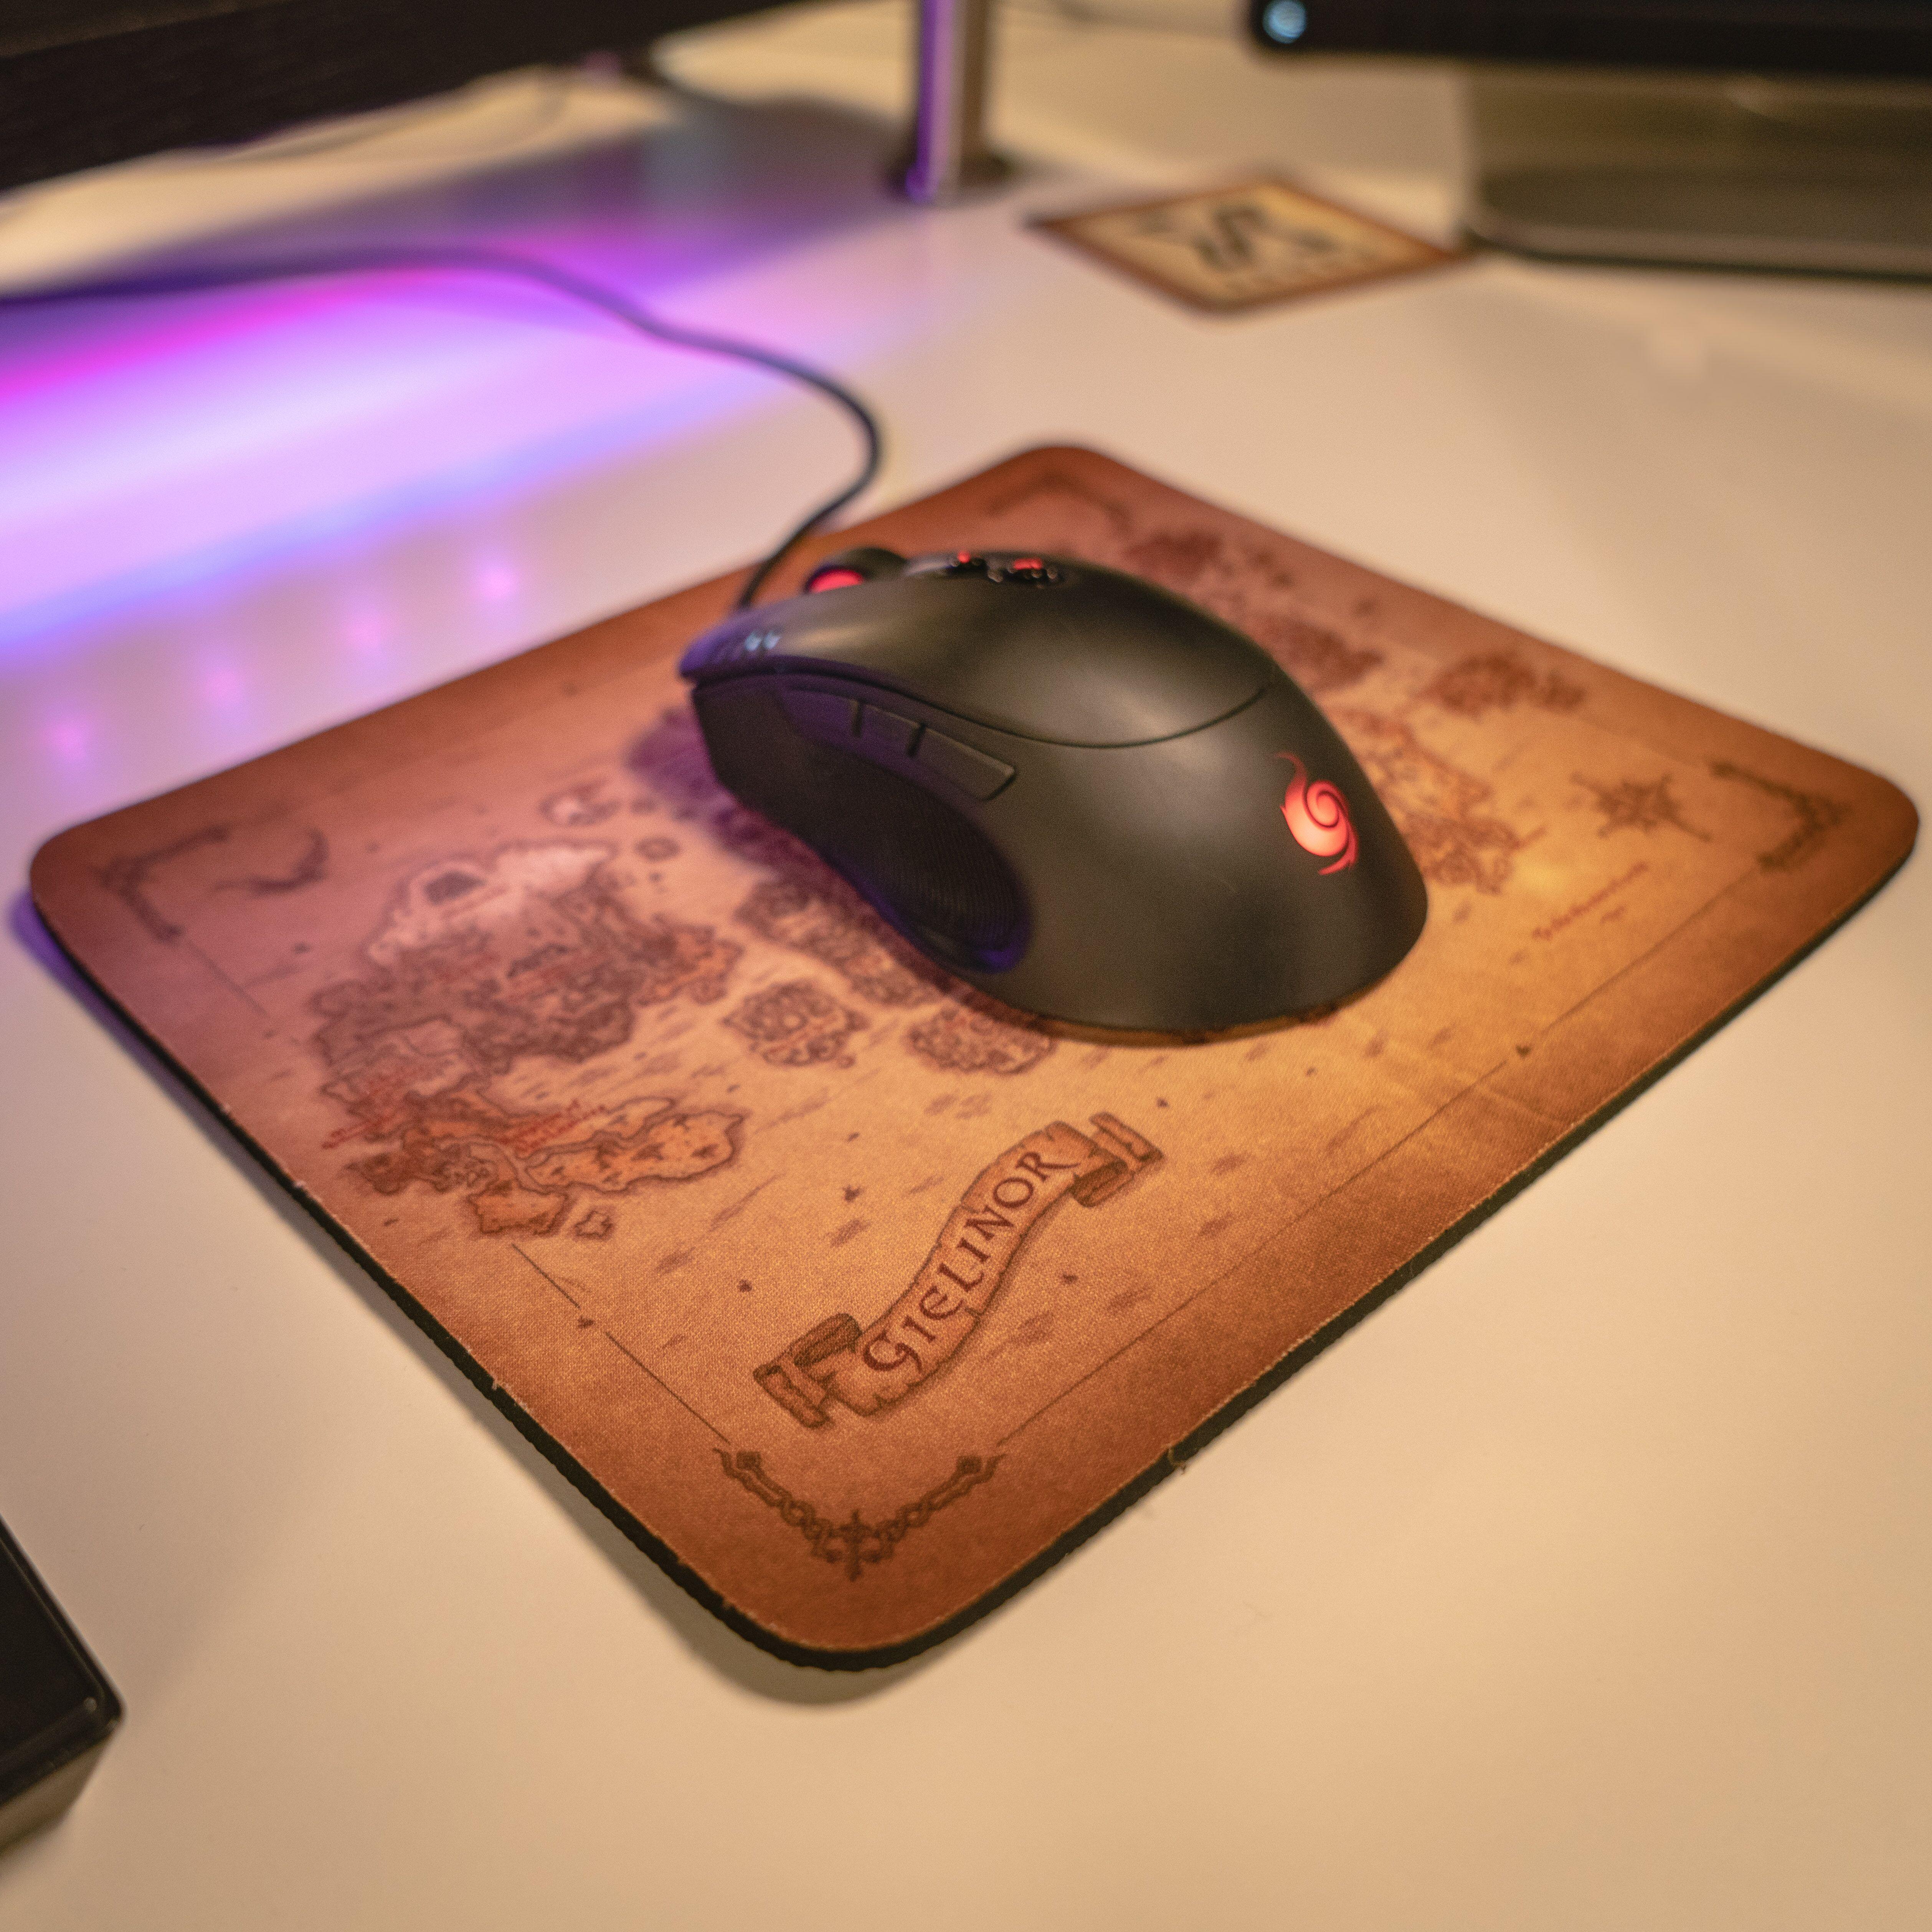 Osrs Mouse Keys Allowed